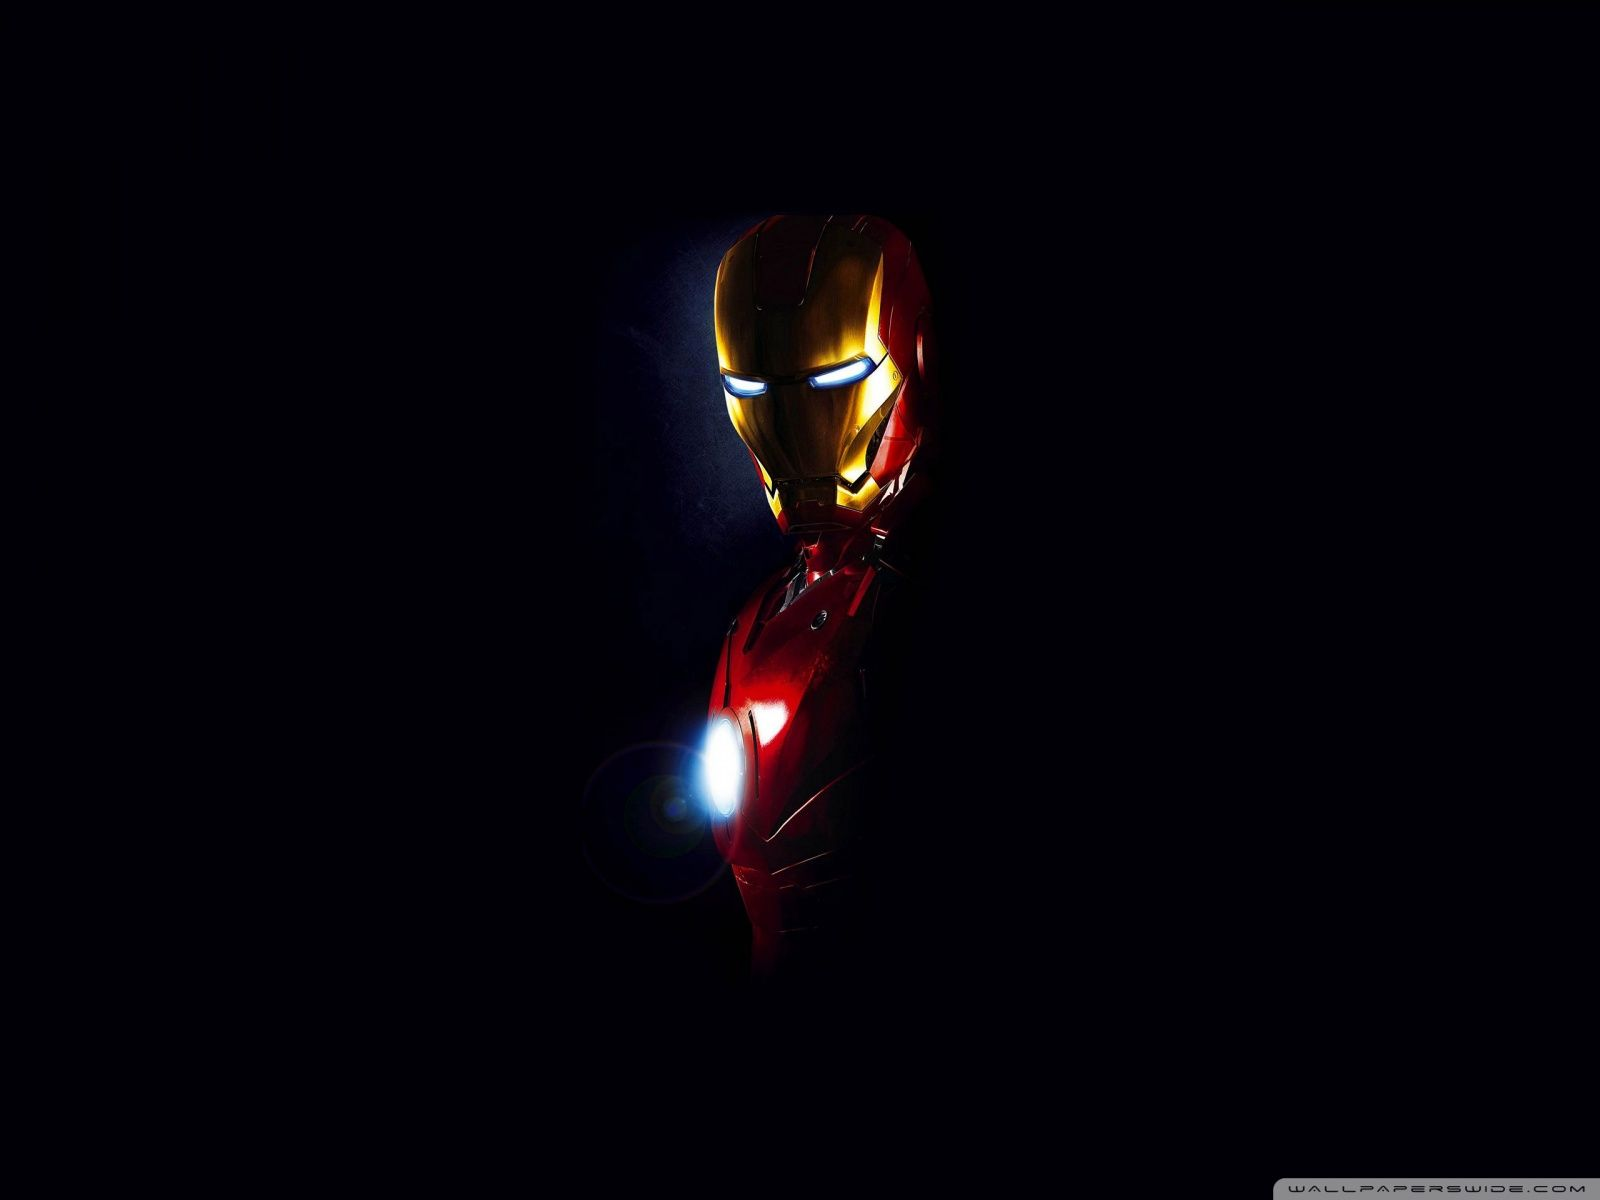 I Am Iron Man Iron Man Wallpaper Iron Man Hd Wallpaper Man Wallpaper